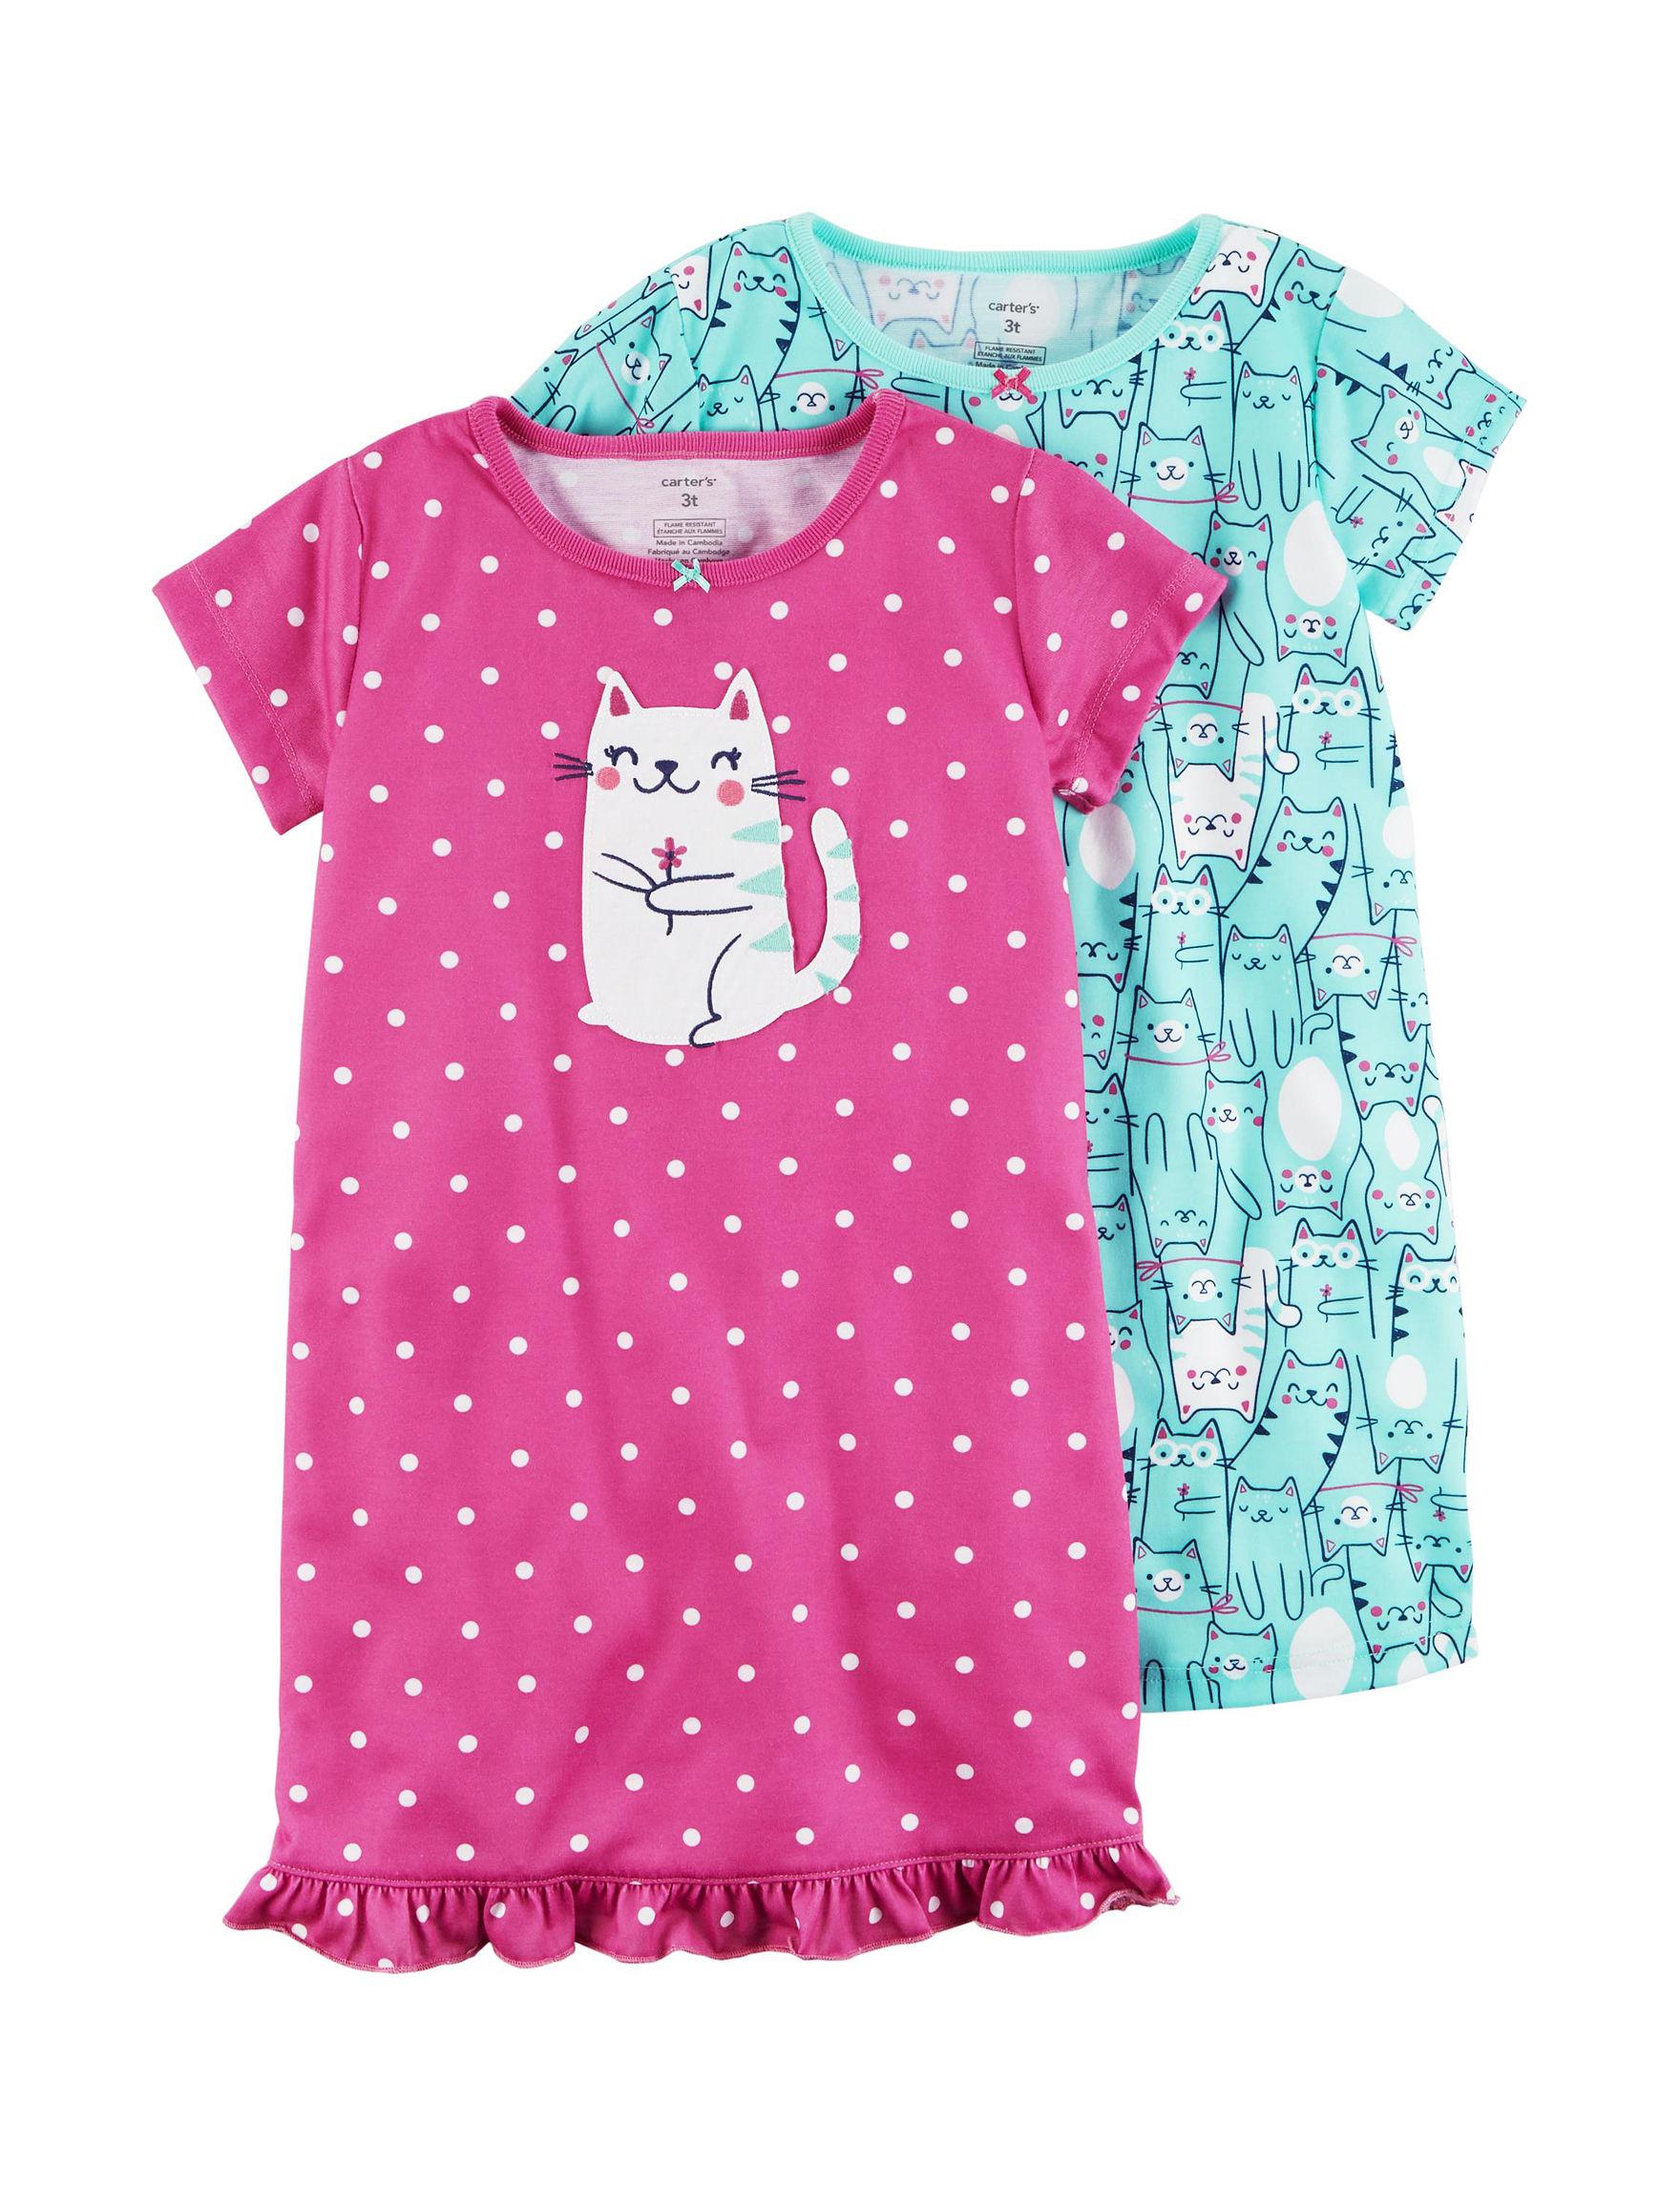 Carter's Pink / Blue Nightgowns & Sleep Shirts